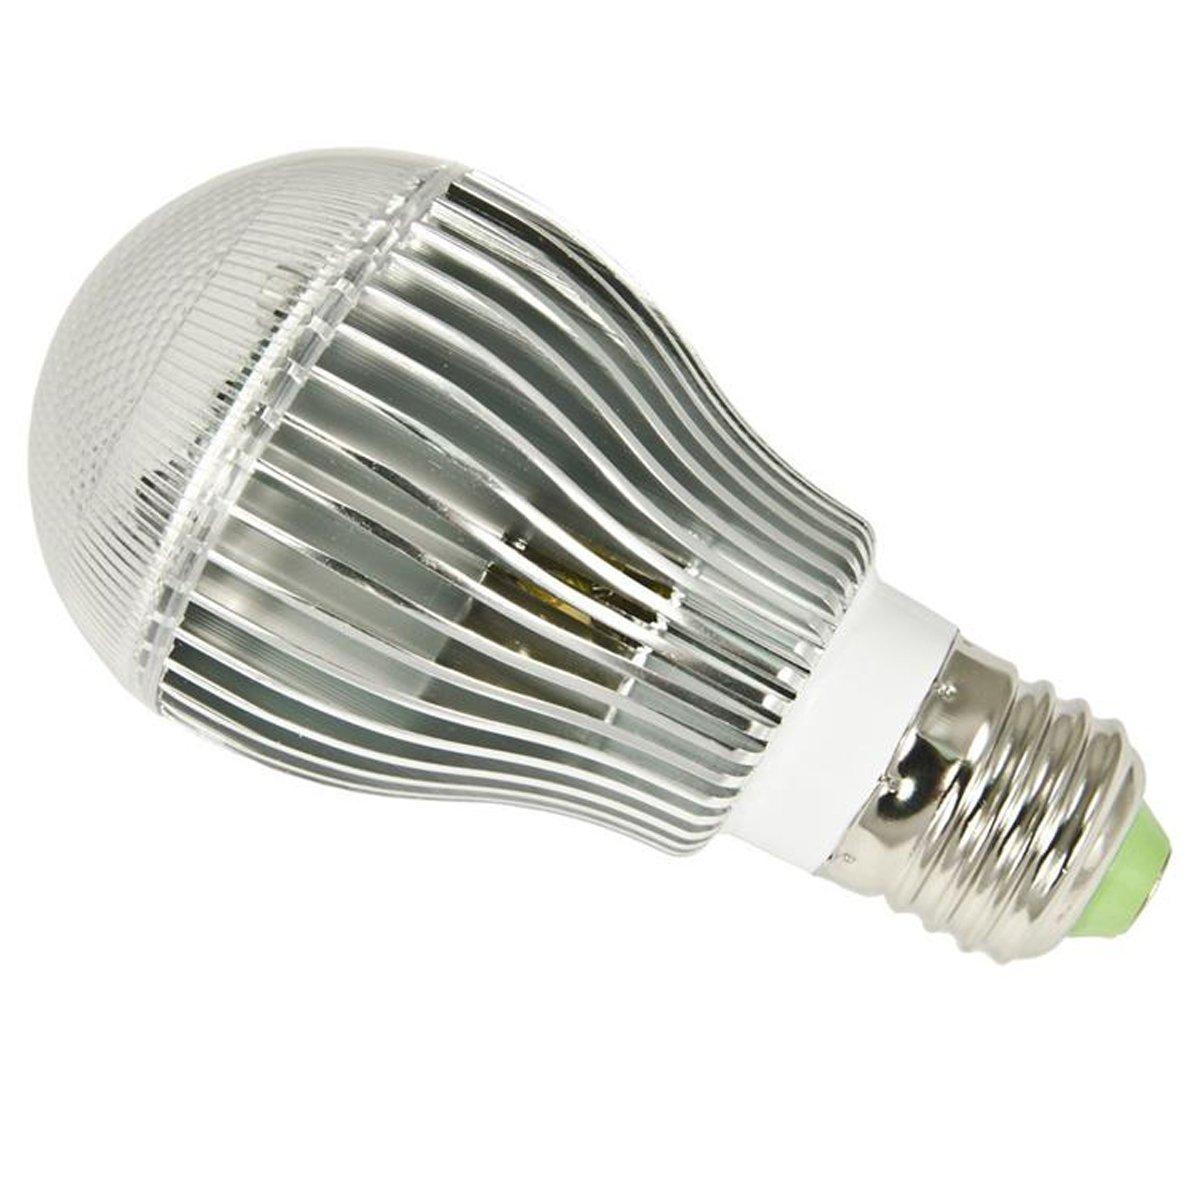 neue e27 3w 5w 9w rgb bunte led birne farbwechsel lampe licht mit fernbedienung ebay. Black Bedroom Furniture Sets. Home Design Ideas